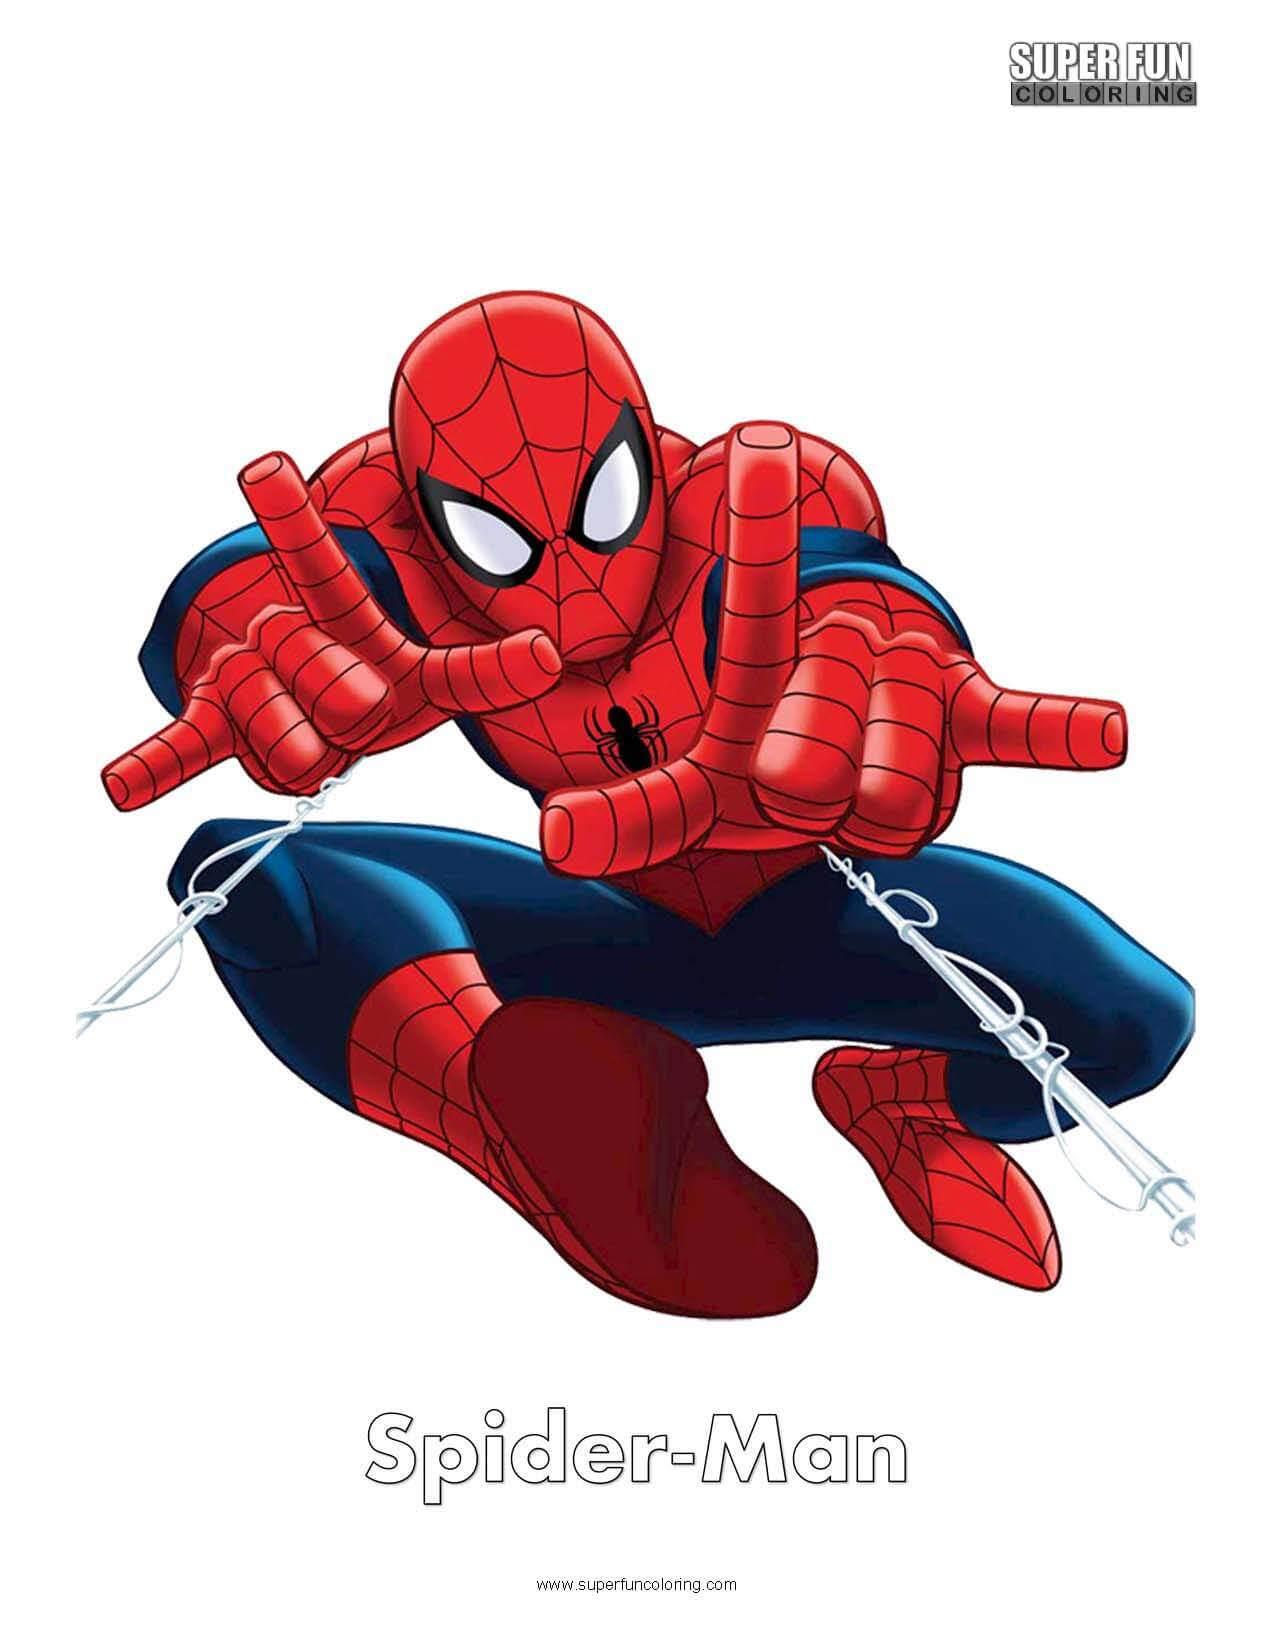 Spider-Man Free Superhero Coloring Page